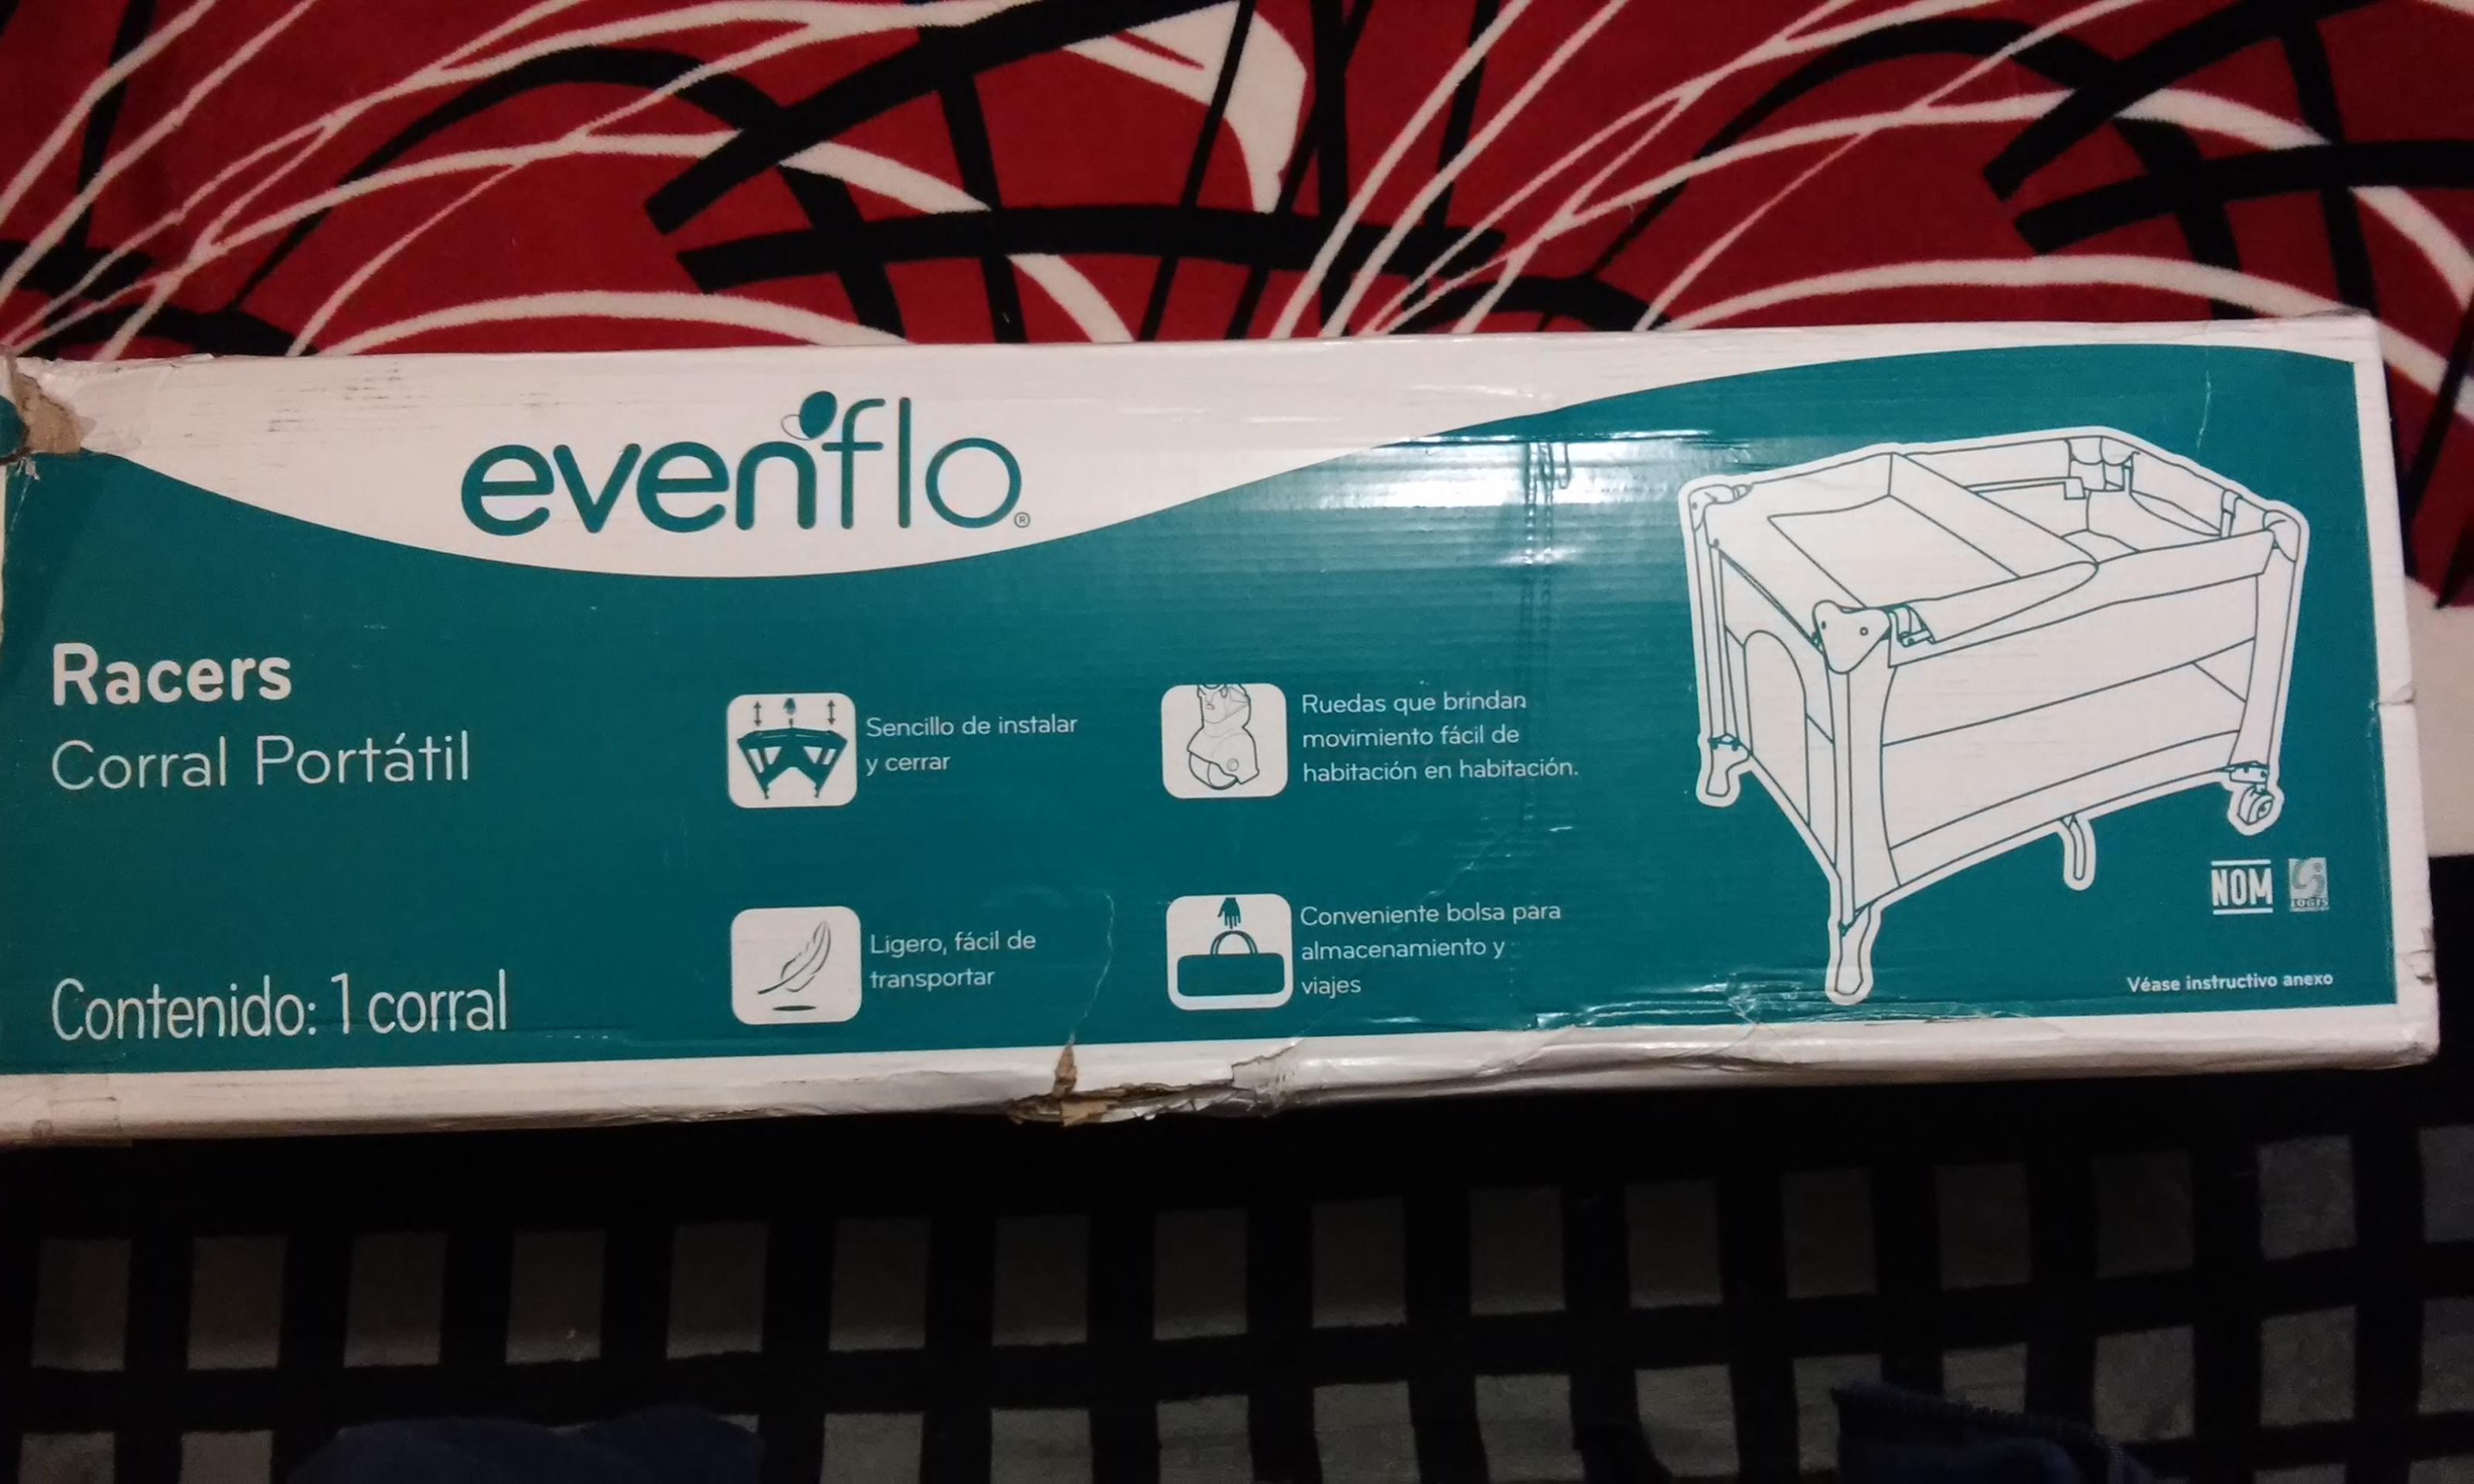 Bodega Aurrerá: Cuna Evenflo a $300.02